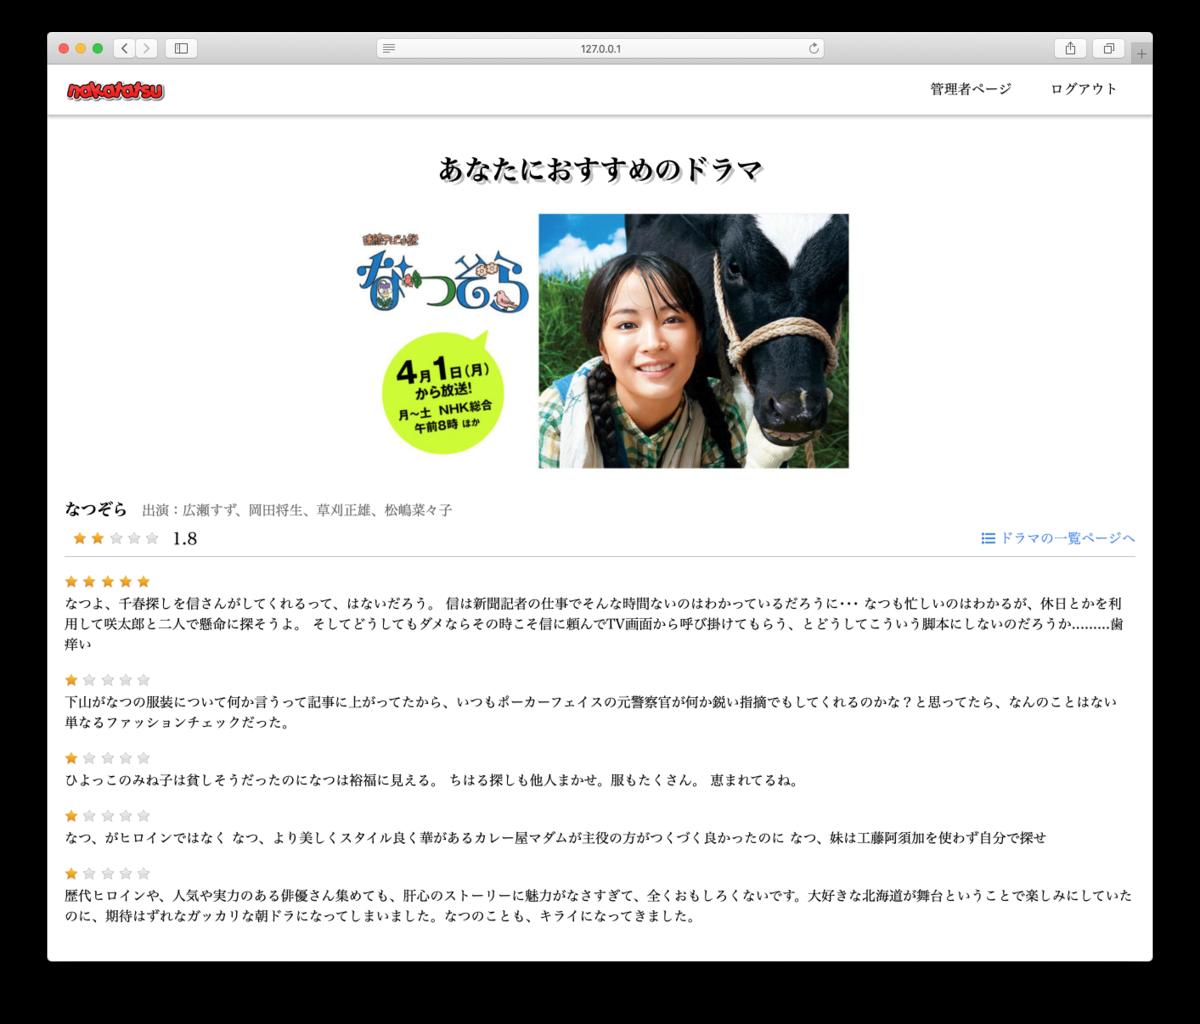 f:id:nakatatsu_com:20190612225733p:plain